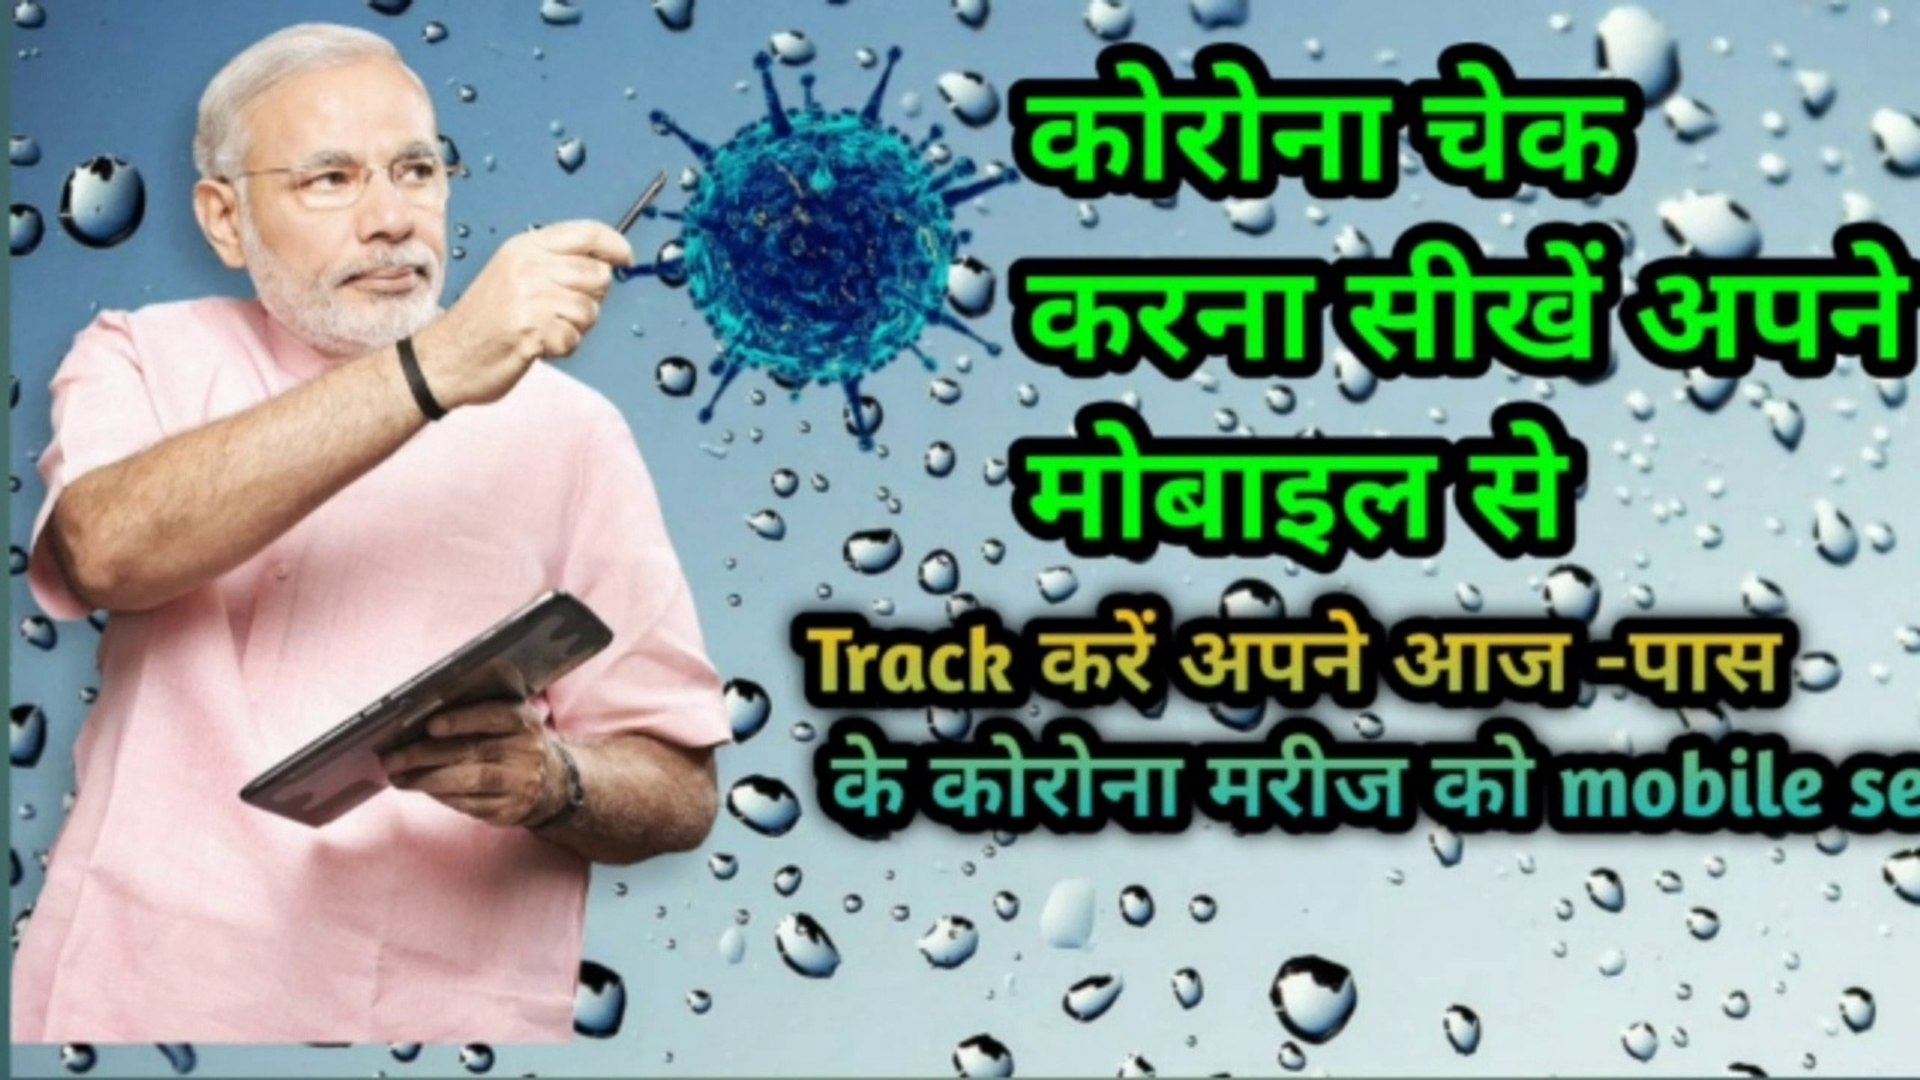 Corona virus alert app | corona virus tracking app | Aarogya setu app kaise | corona virus  |  coron